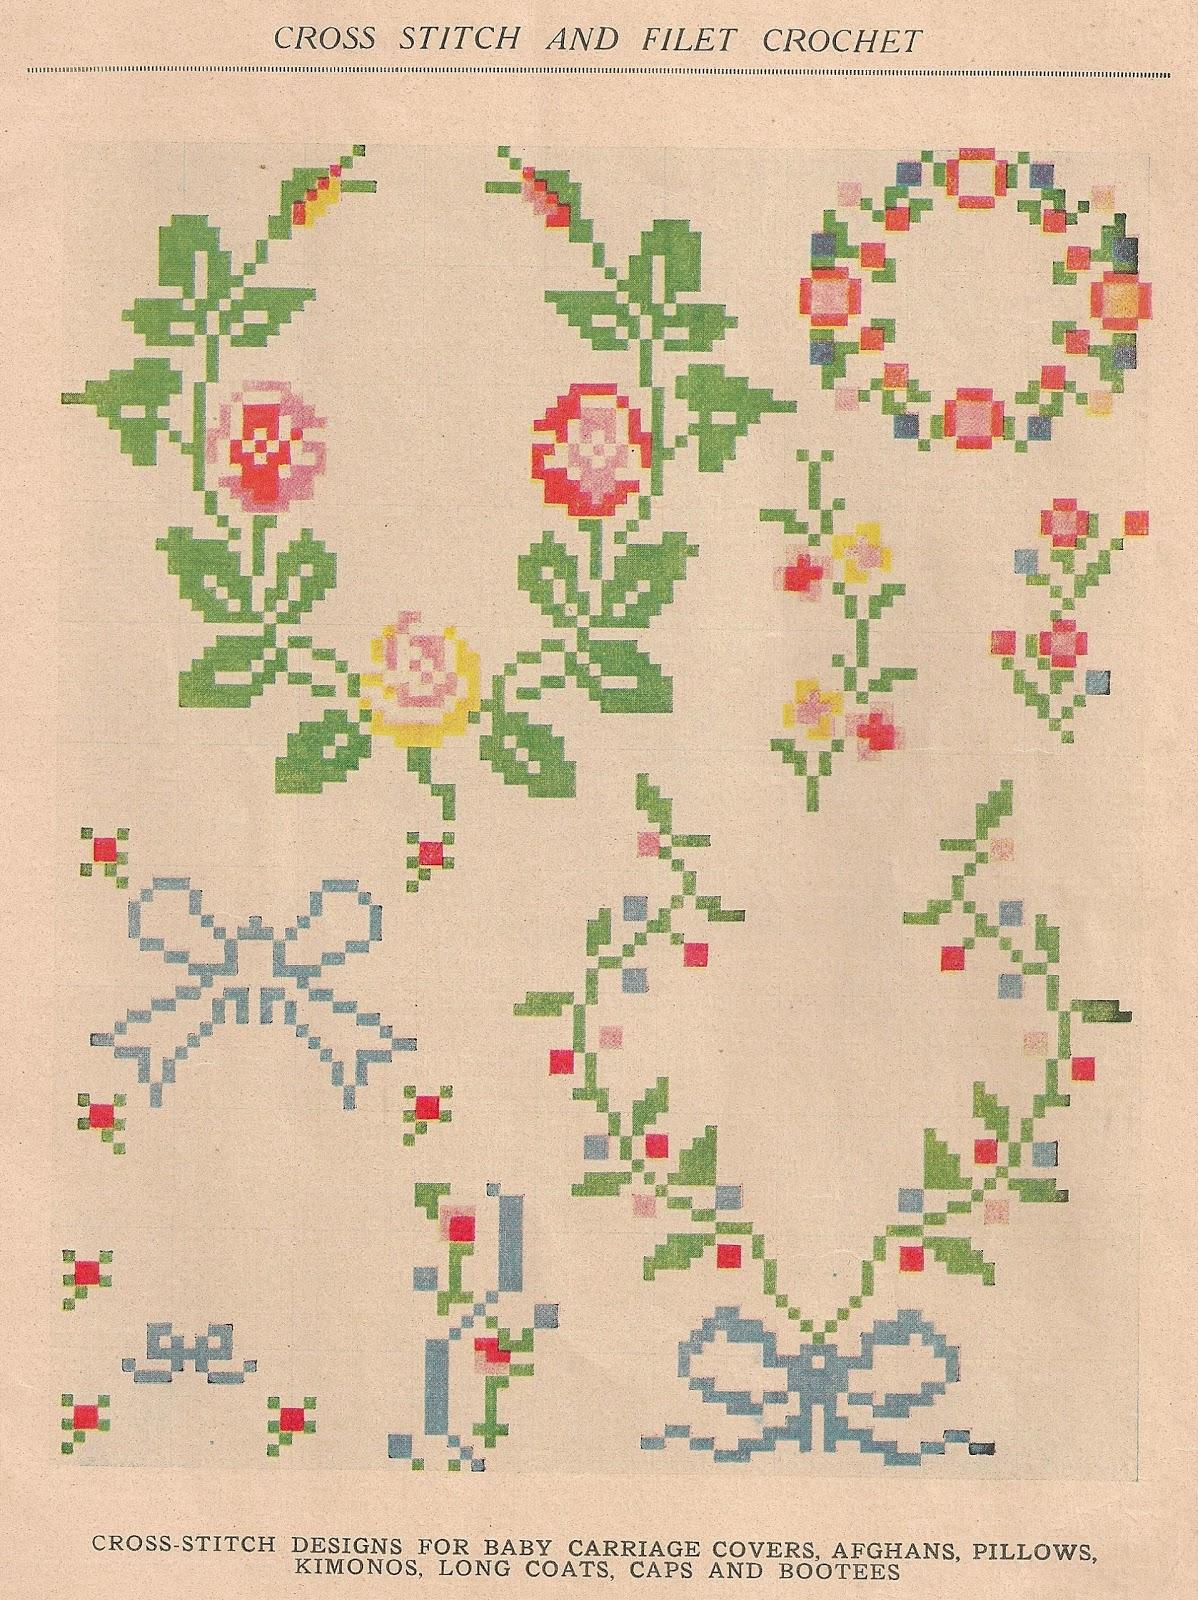 Sentimental Baby Free Cross Stitch Or Filet Crochet